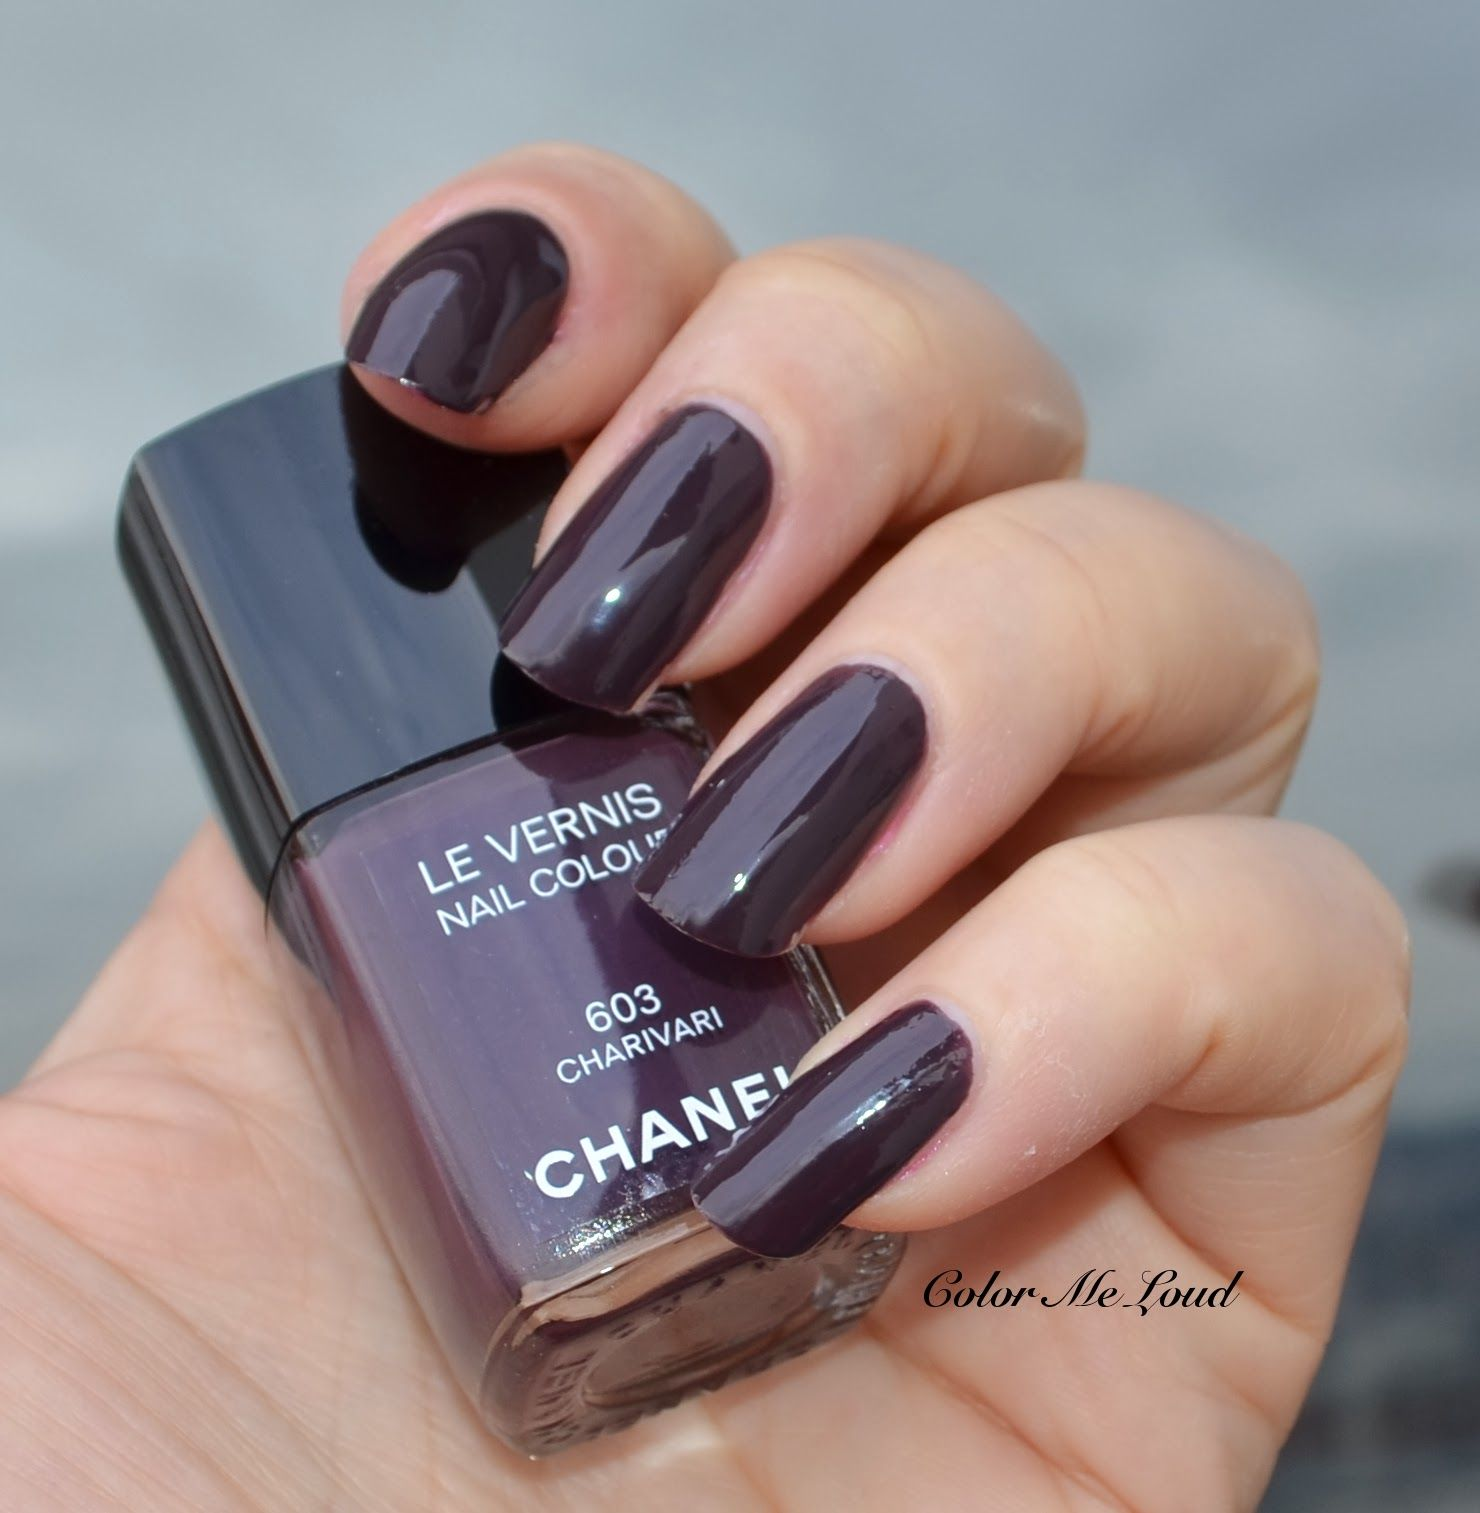 Chanel Nail Polish Cake: 603 Charivari Nail Colour Via 'Color